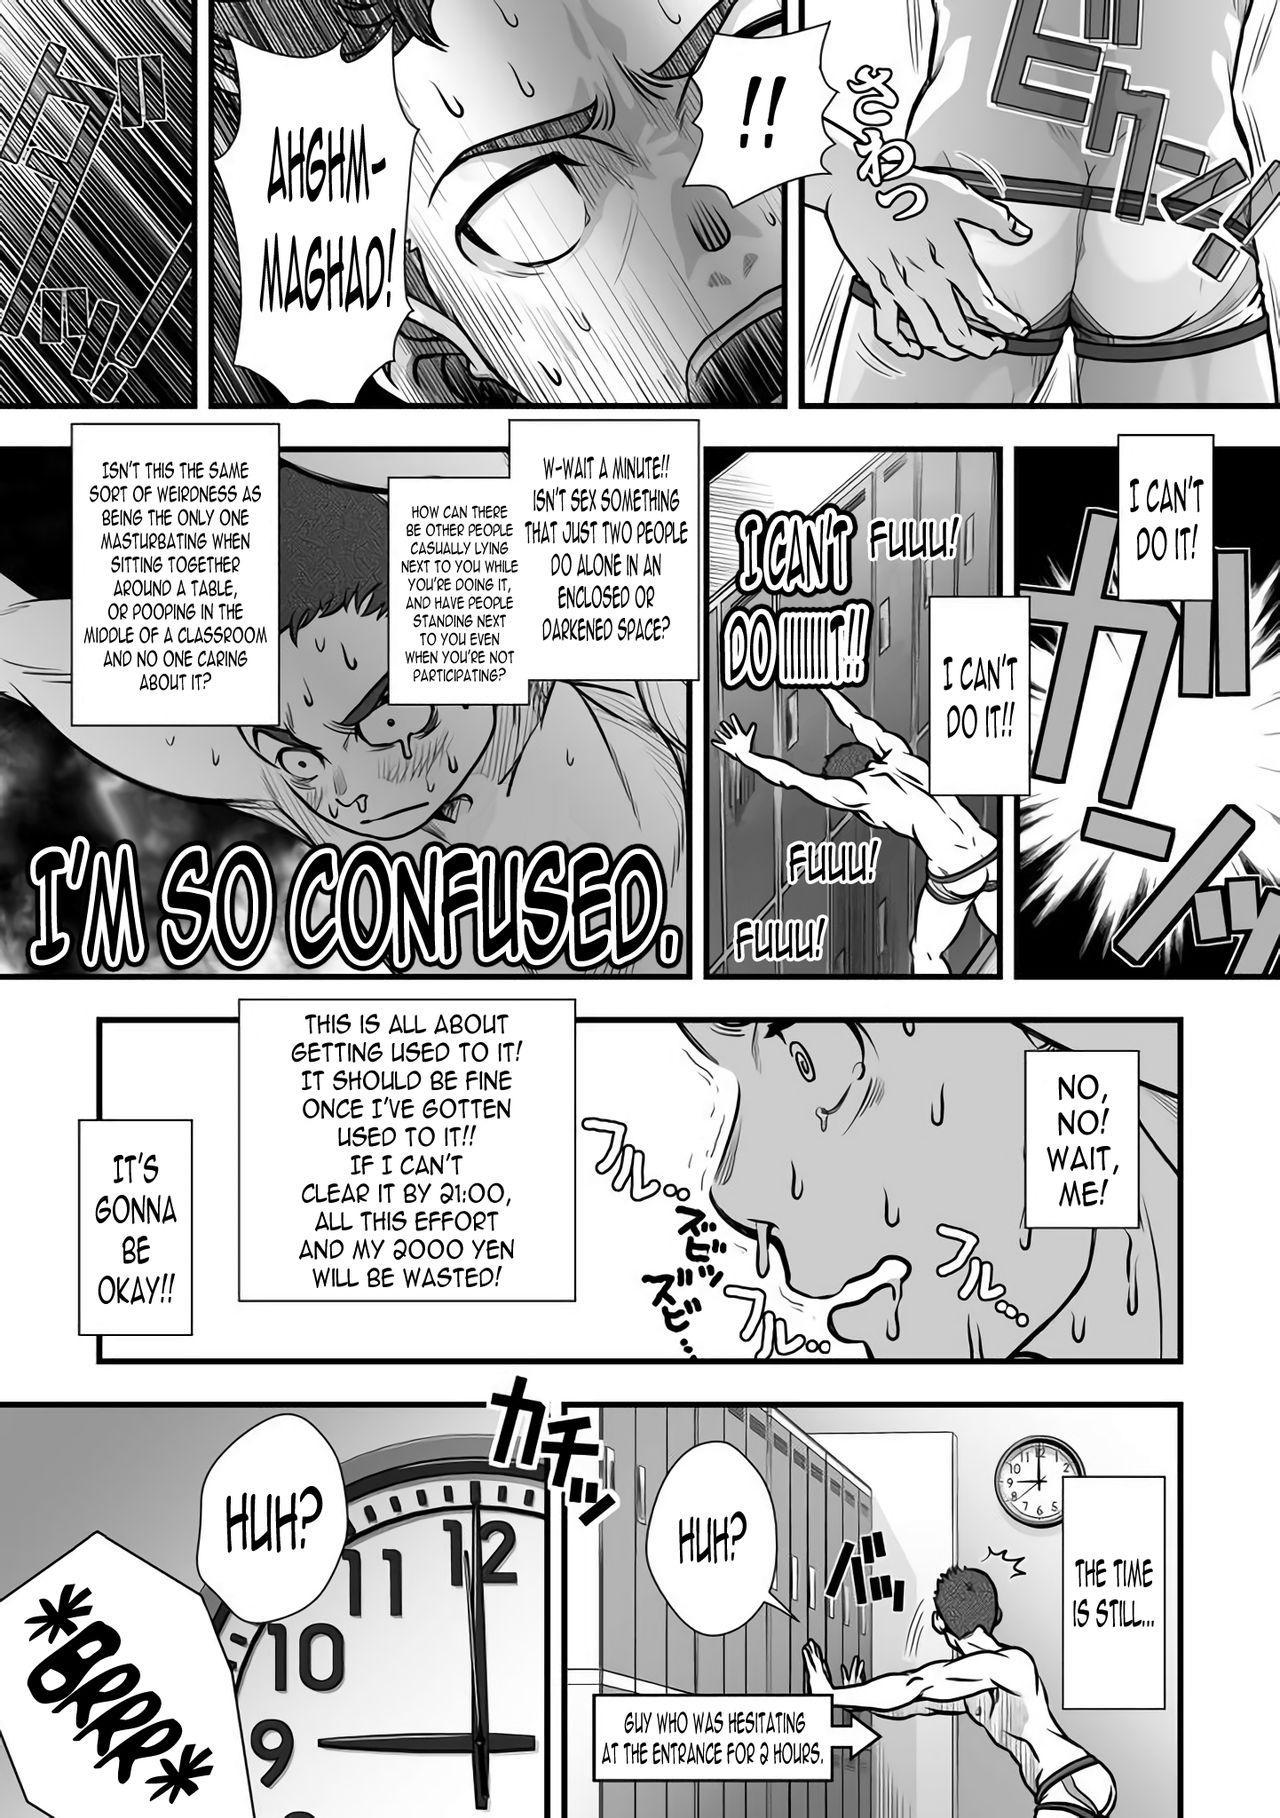 [Pagumiee (Kenta)] Tatakae!+++ (Plus-san)!! [English] [N04h] [Digital] 38